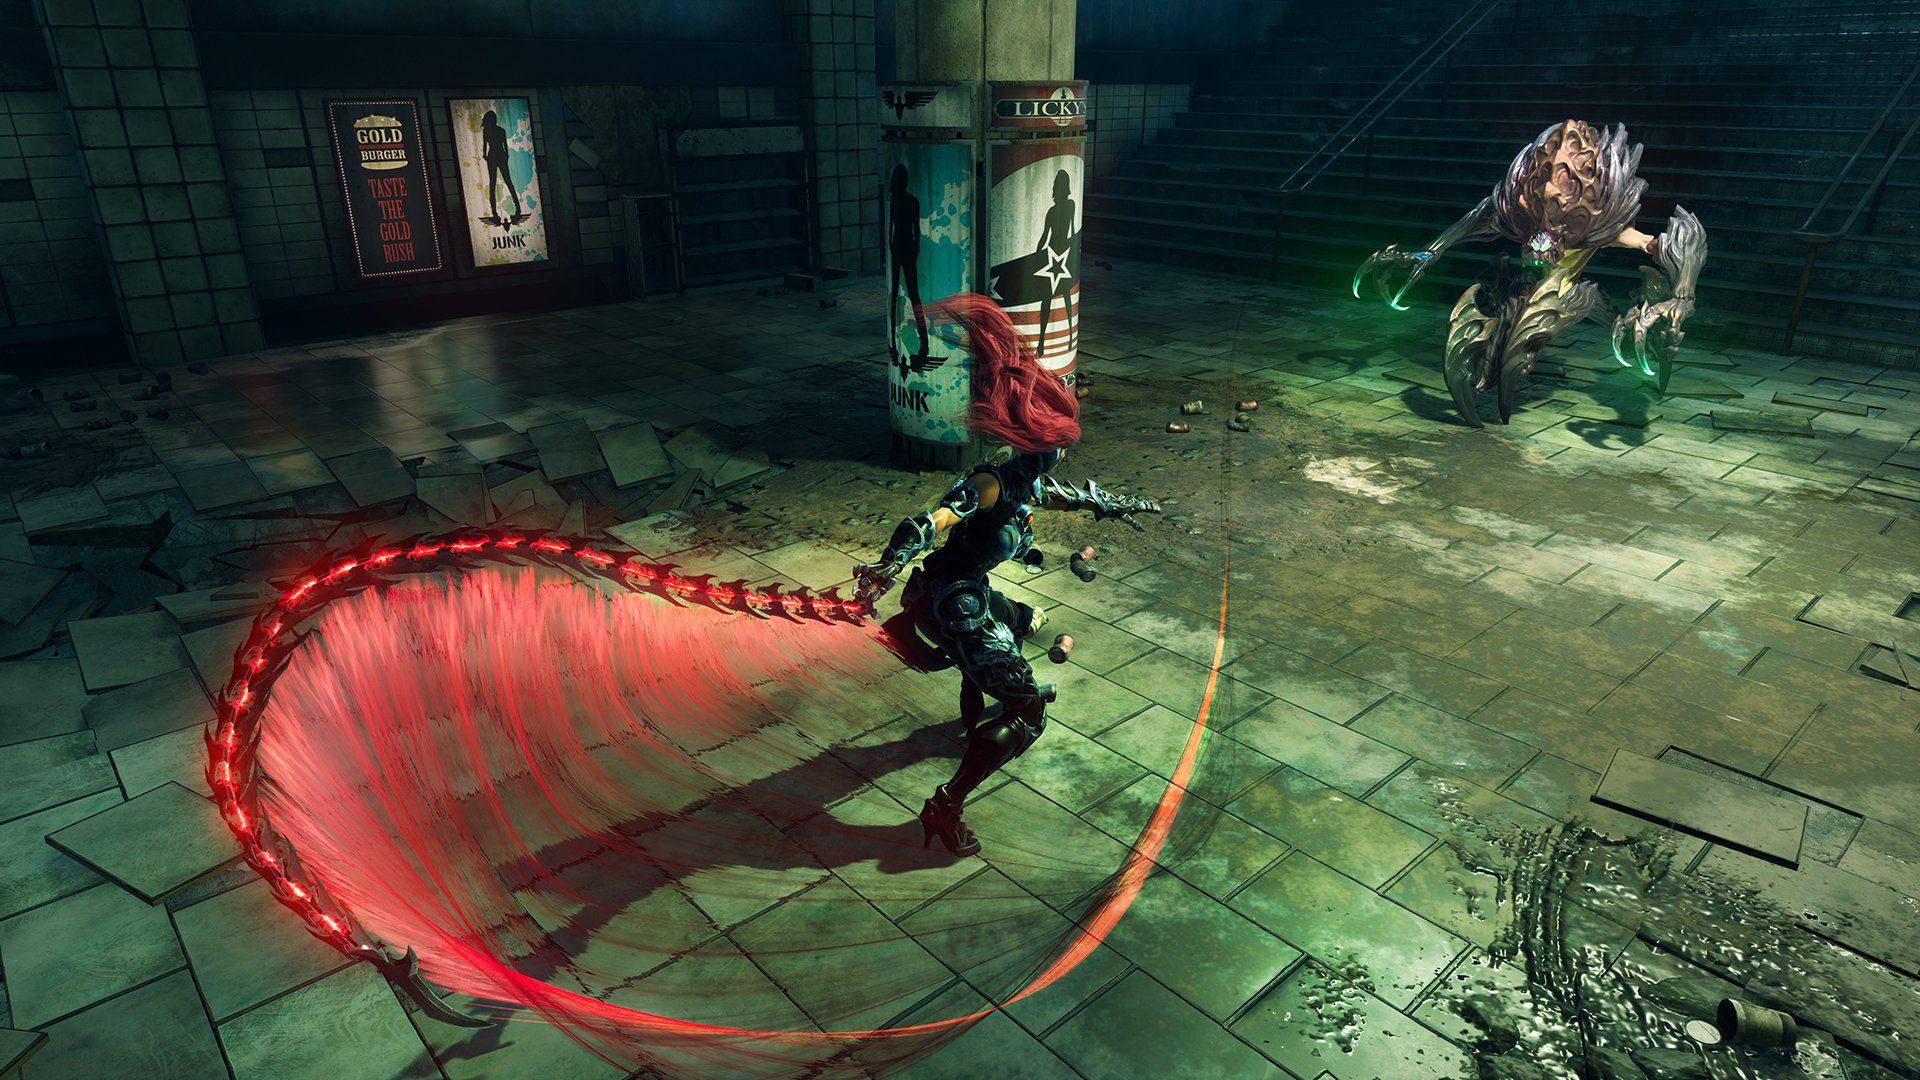 Primer gameplay de Darksiders 3 de Furia contra un jefe